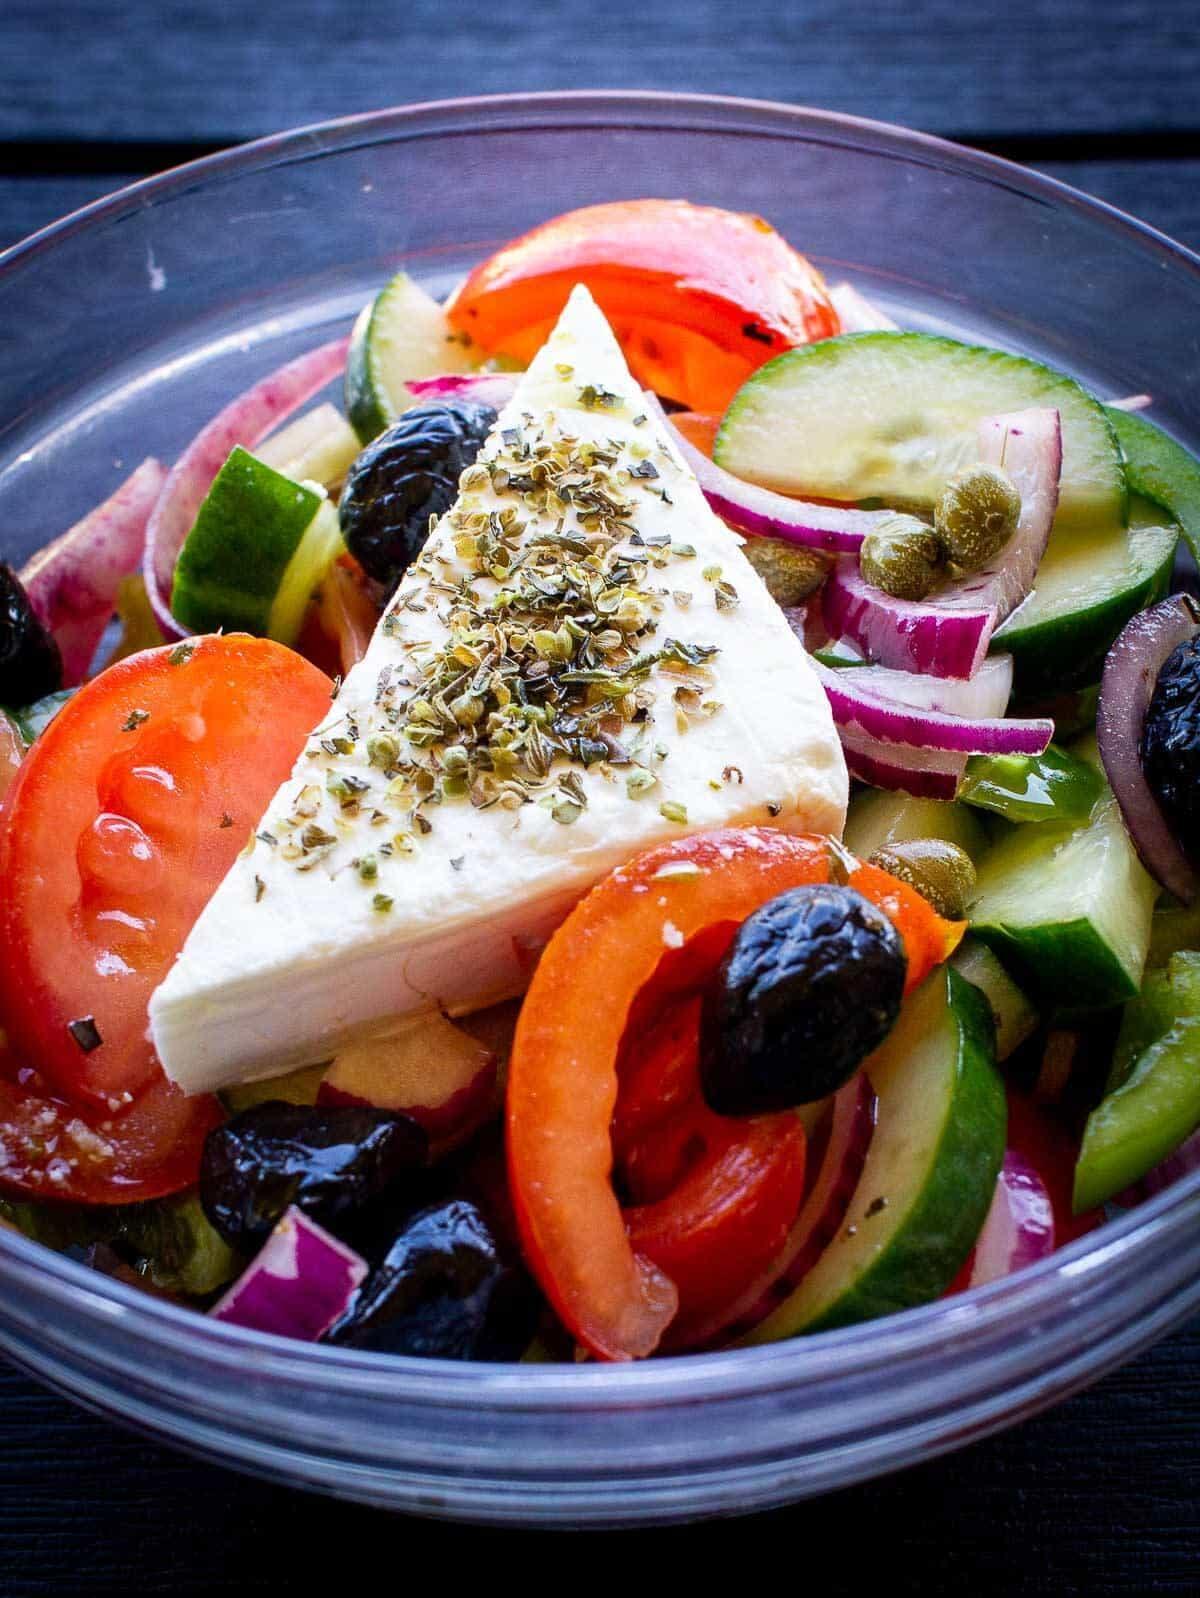 greek salad front view